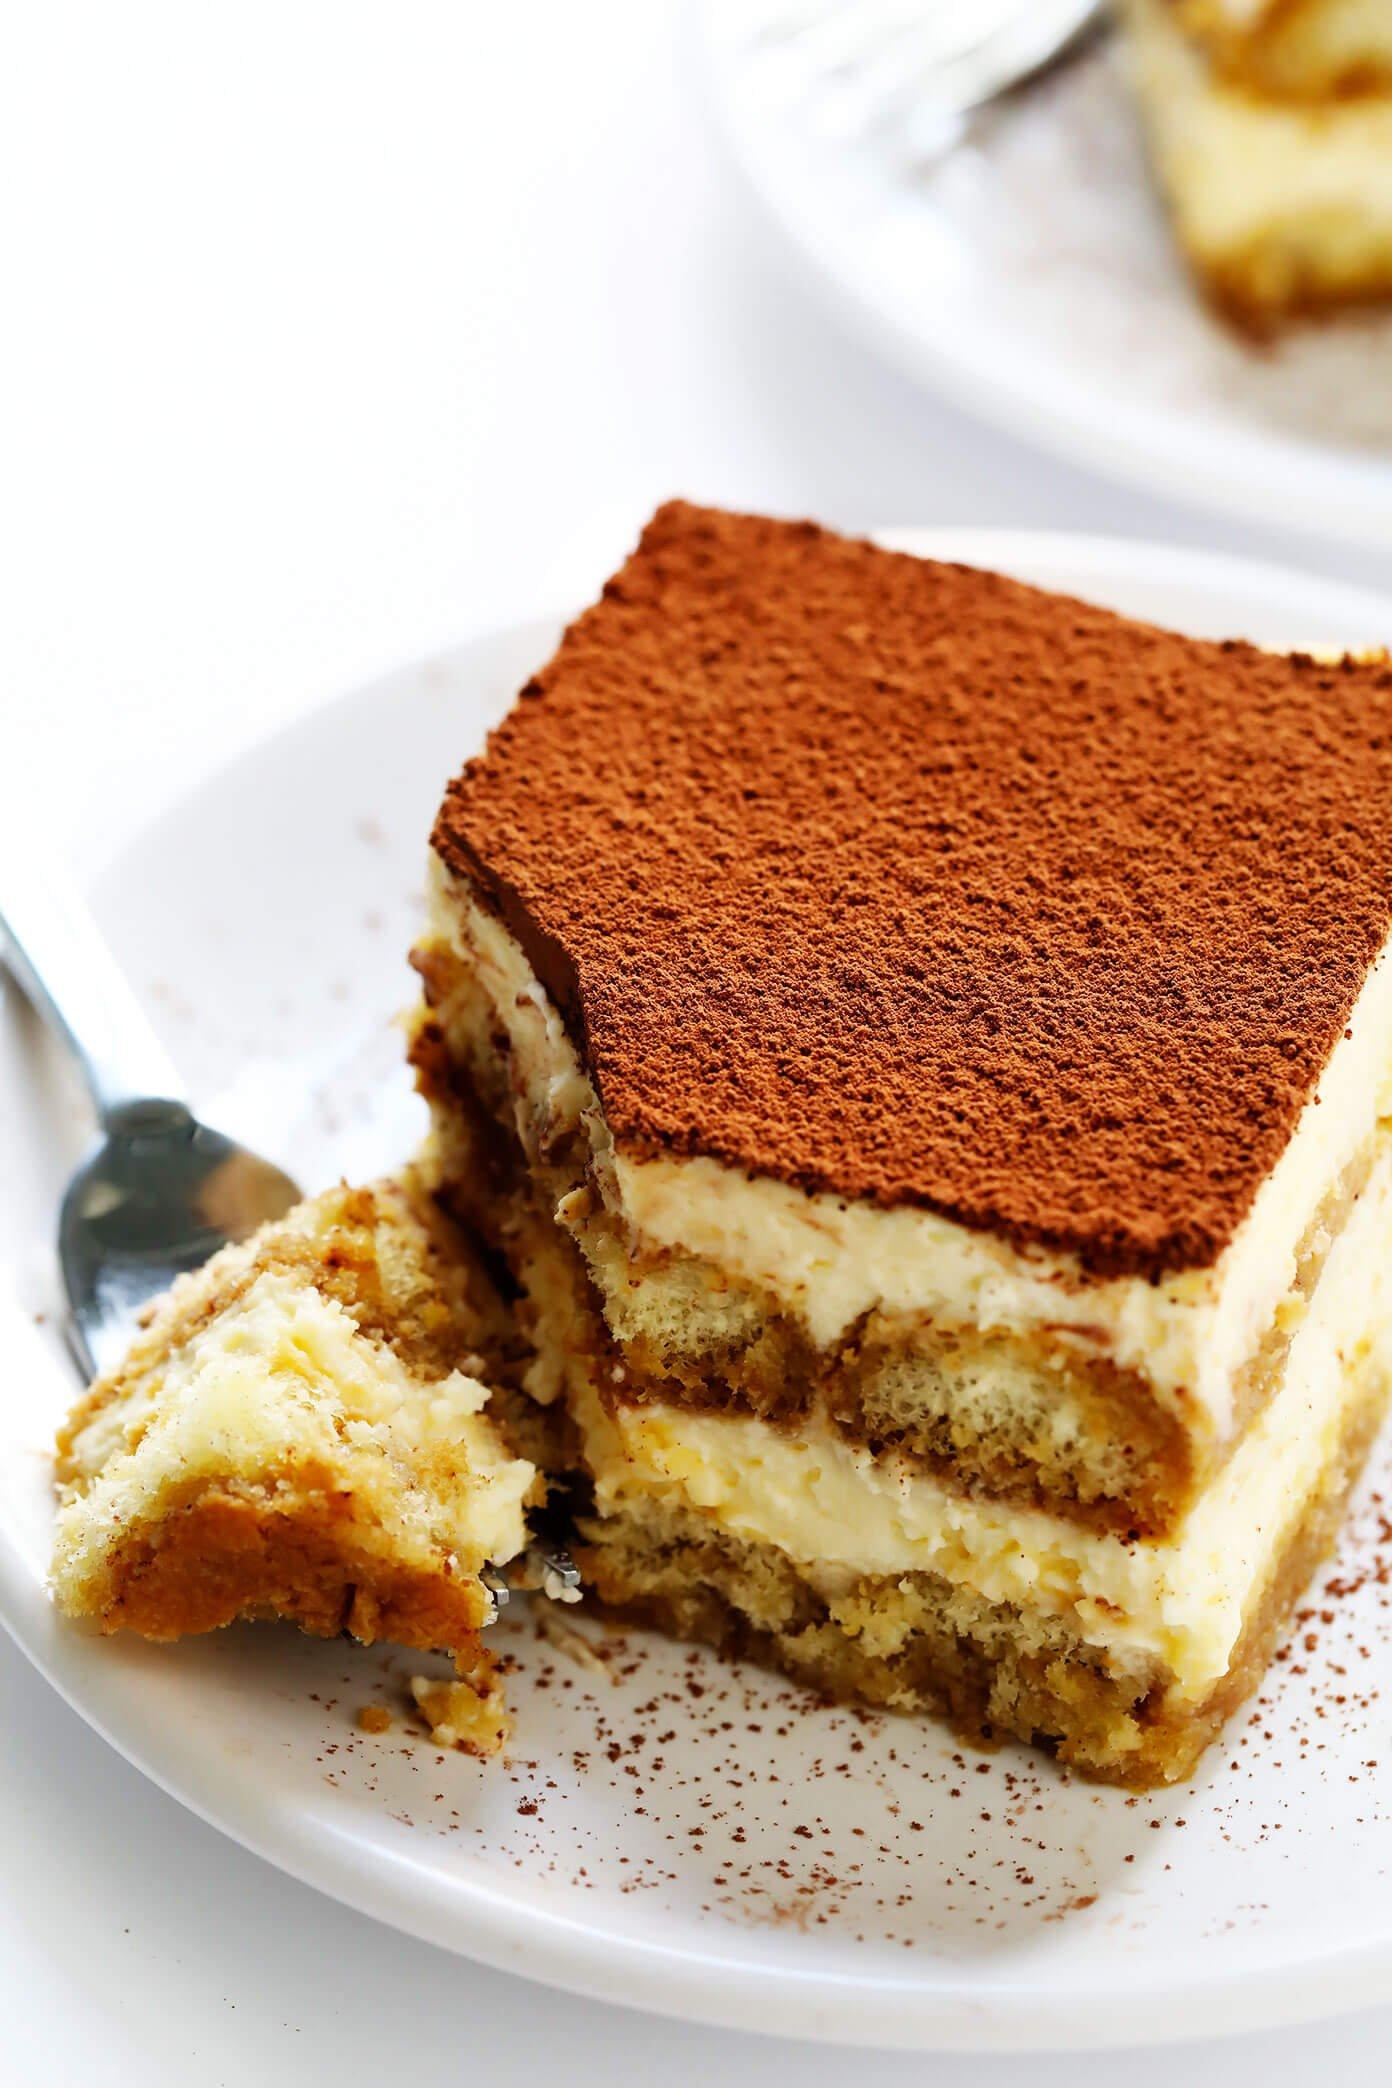 Italian tiramisu on serving plate